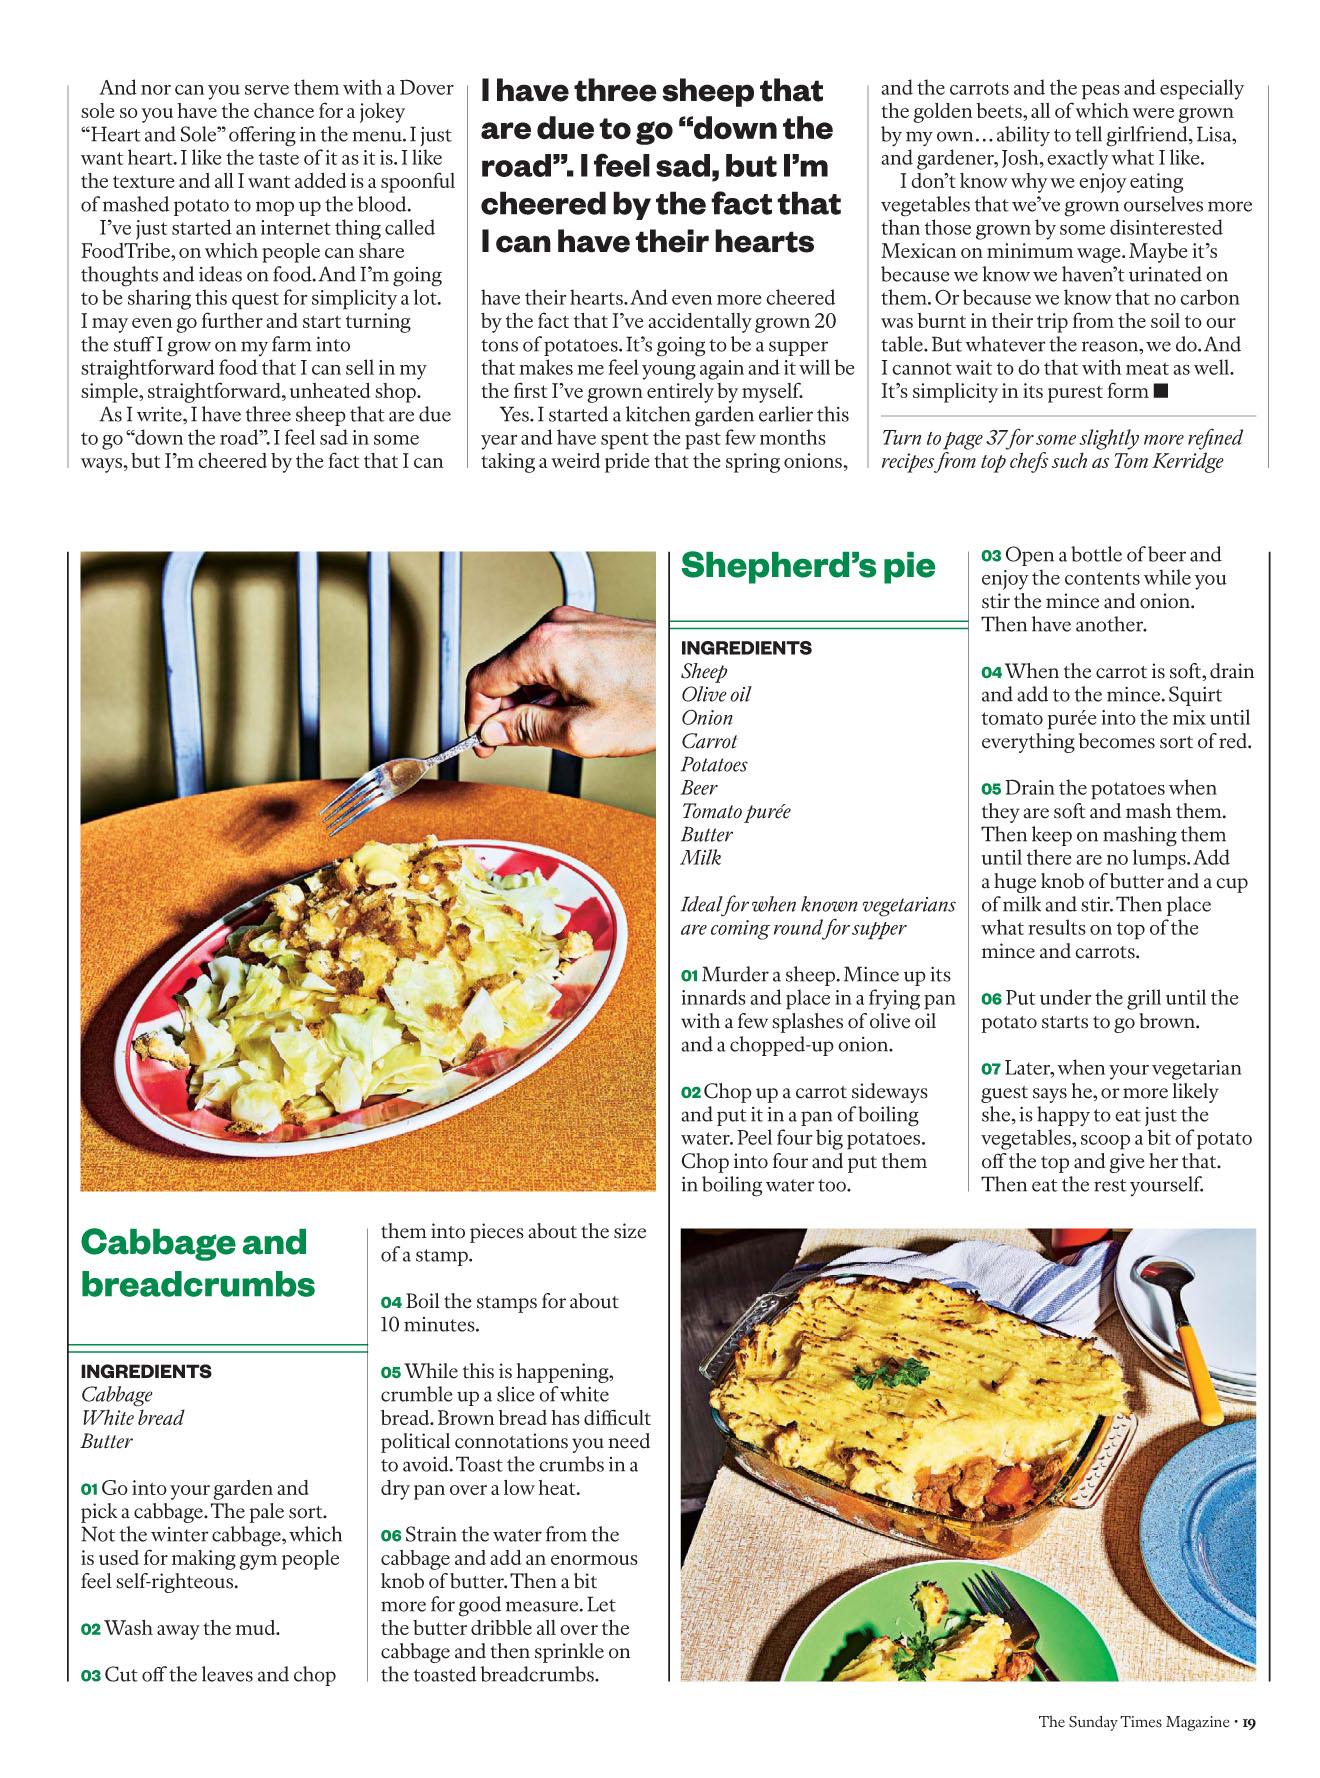 The Sunday Times Magazine 200301 JClarkson-7.jpg